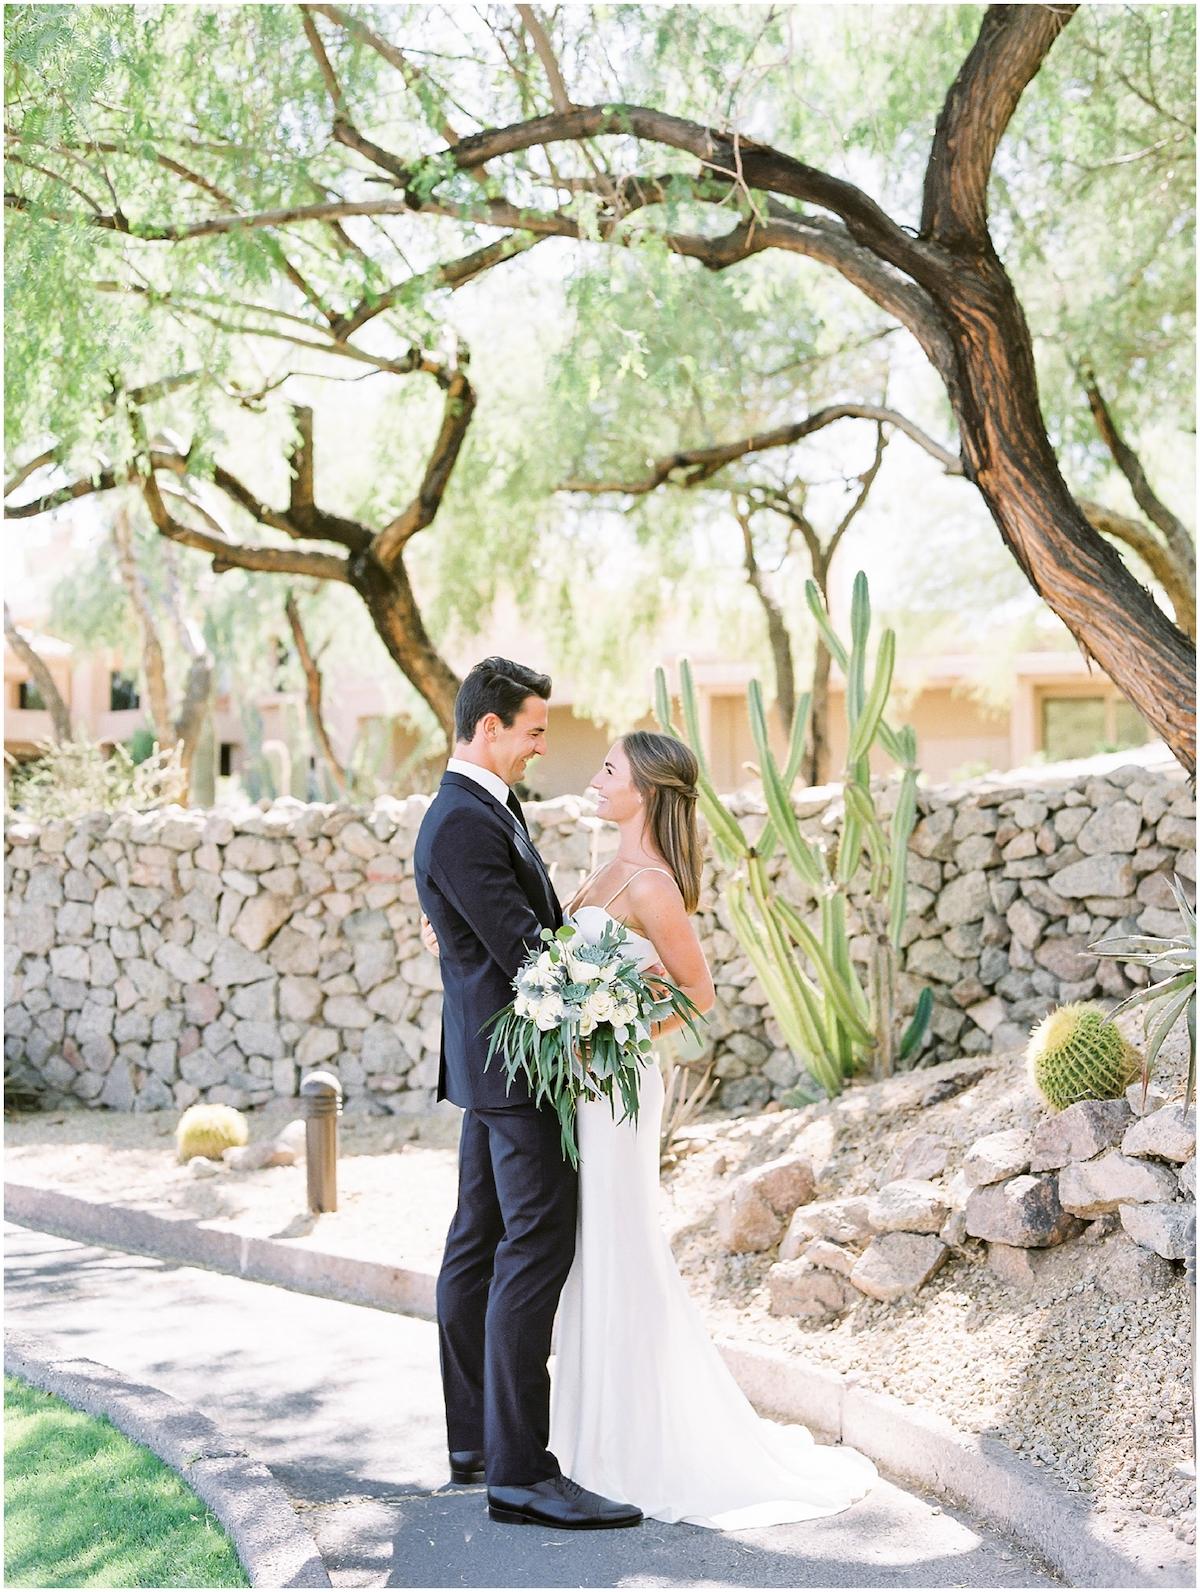 PHOENICIAN BRIDAL PORTRAITS – JESSA & CLINT